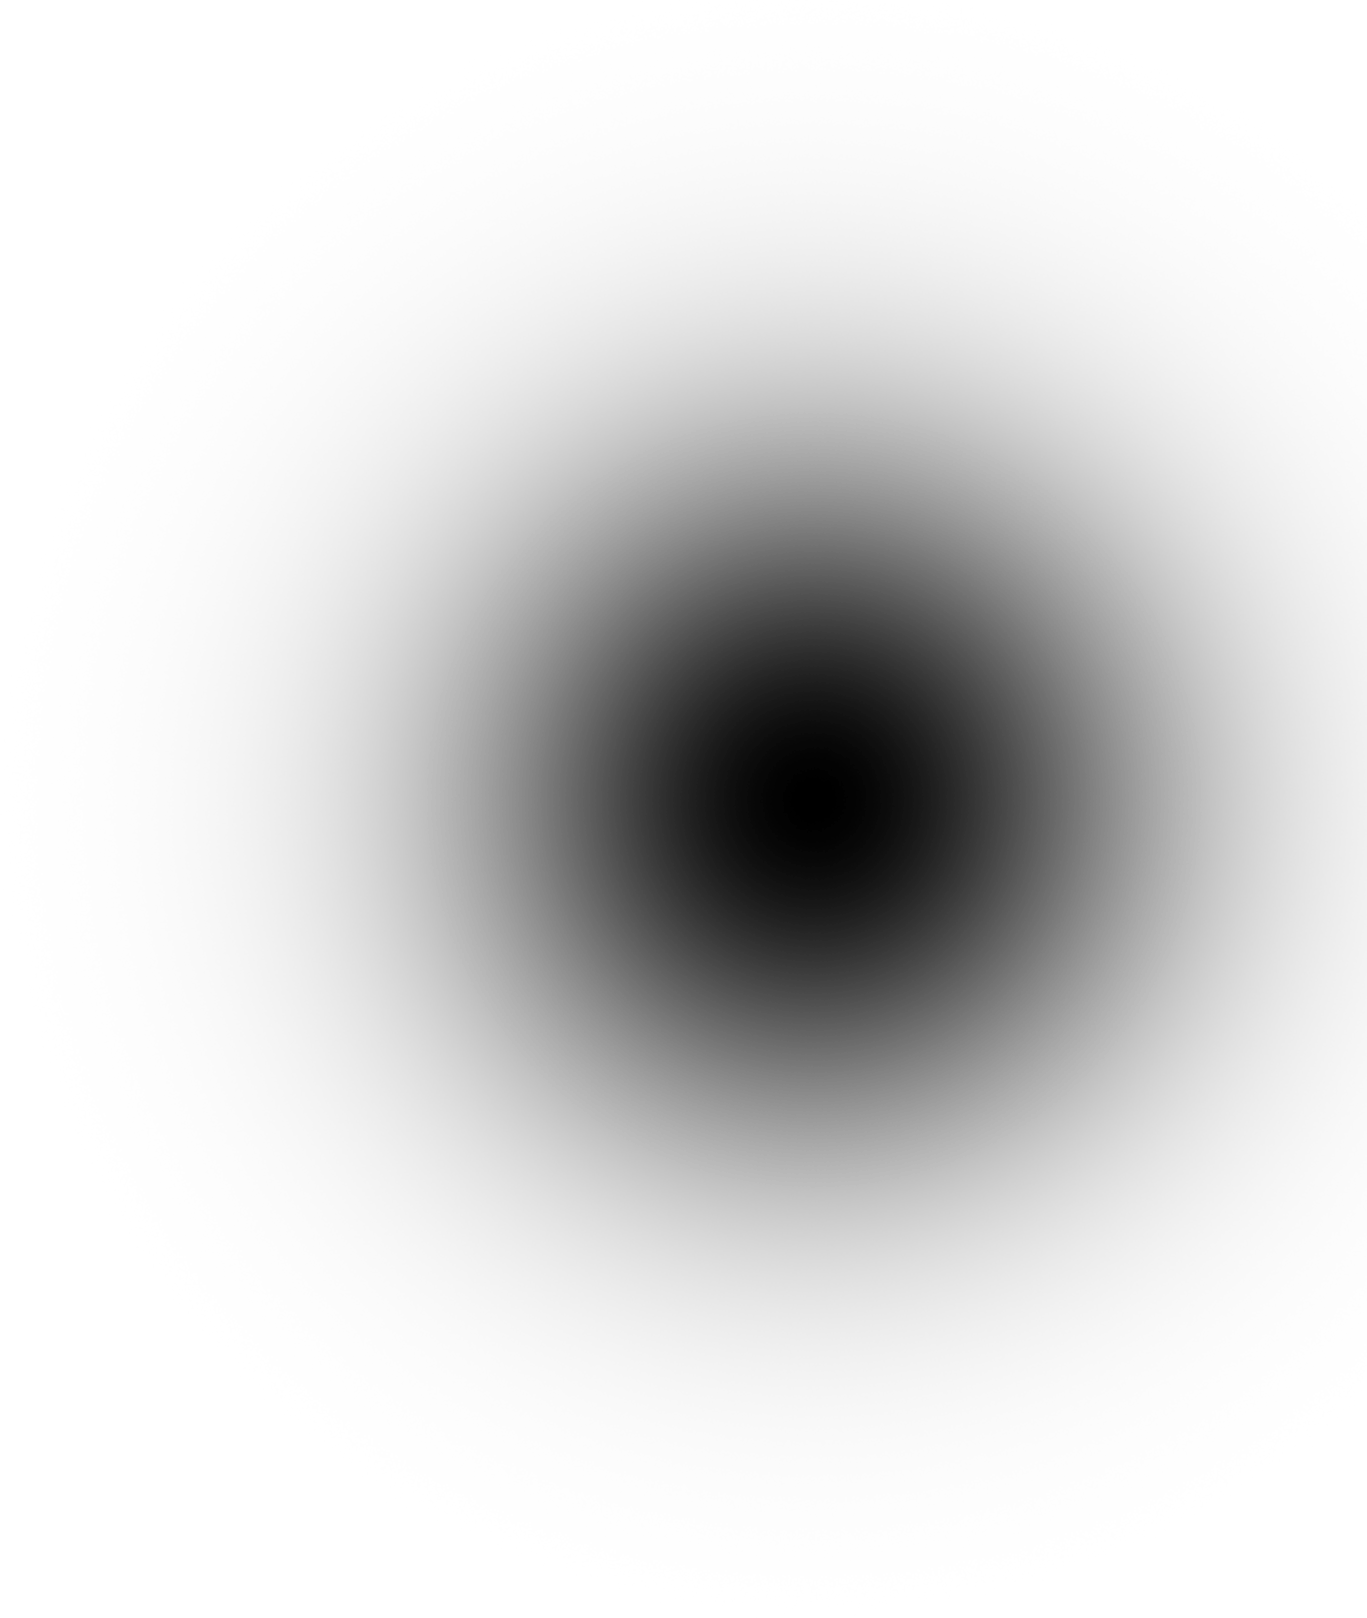 Download Hd Cfm Timeline White Circle Fade Png Circle Shadow Transparent Background Transparent Png Image Nicepng Com Seeking more png image png circle,circle border png,cool circle png? circle shadow transparent background